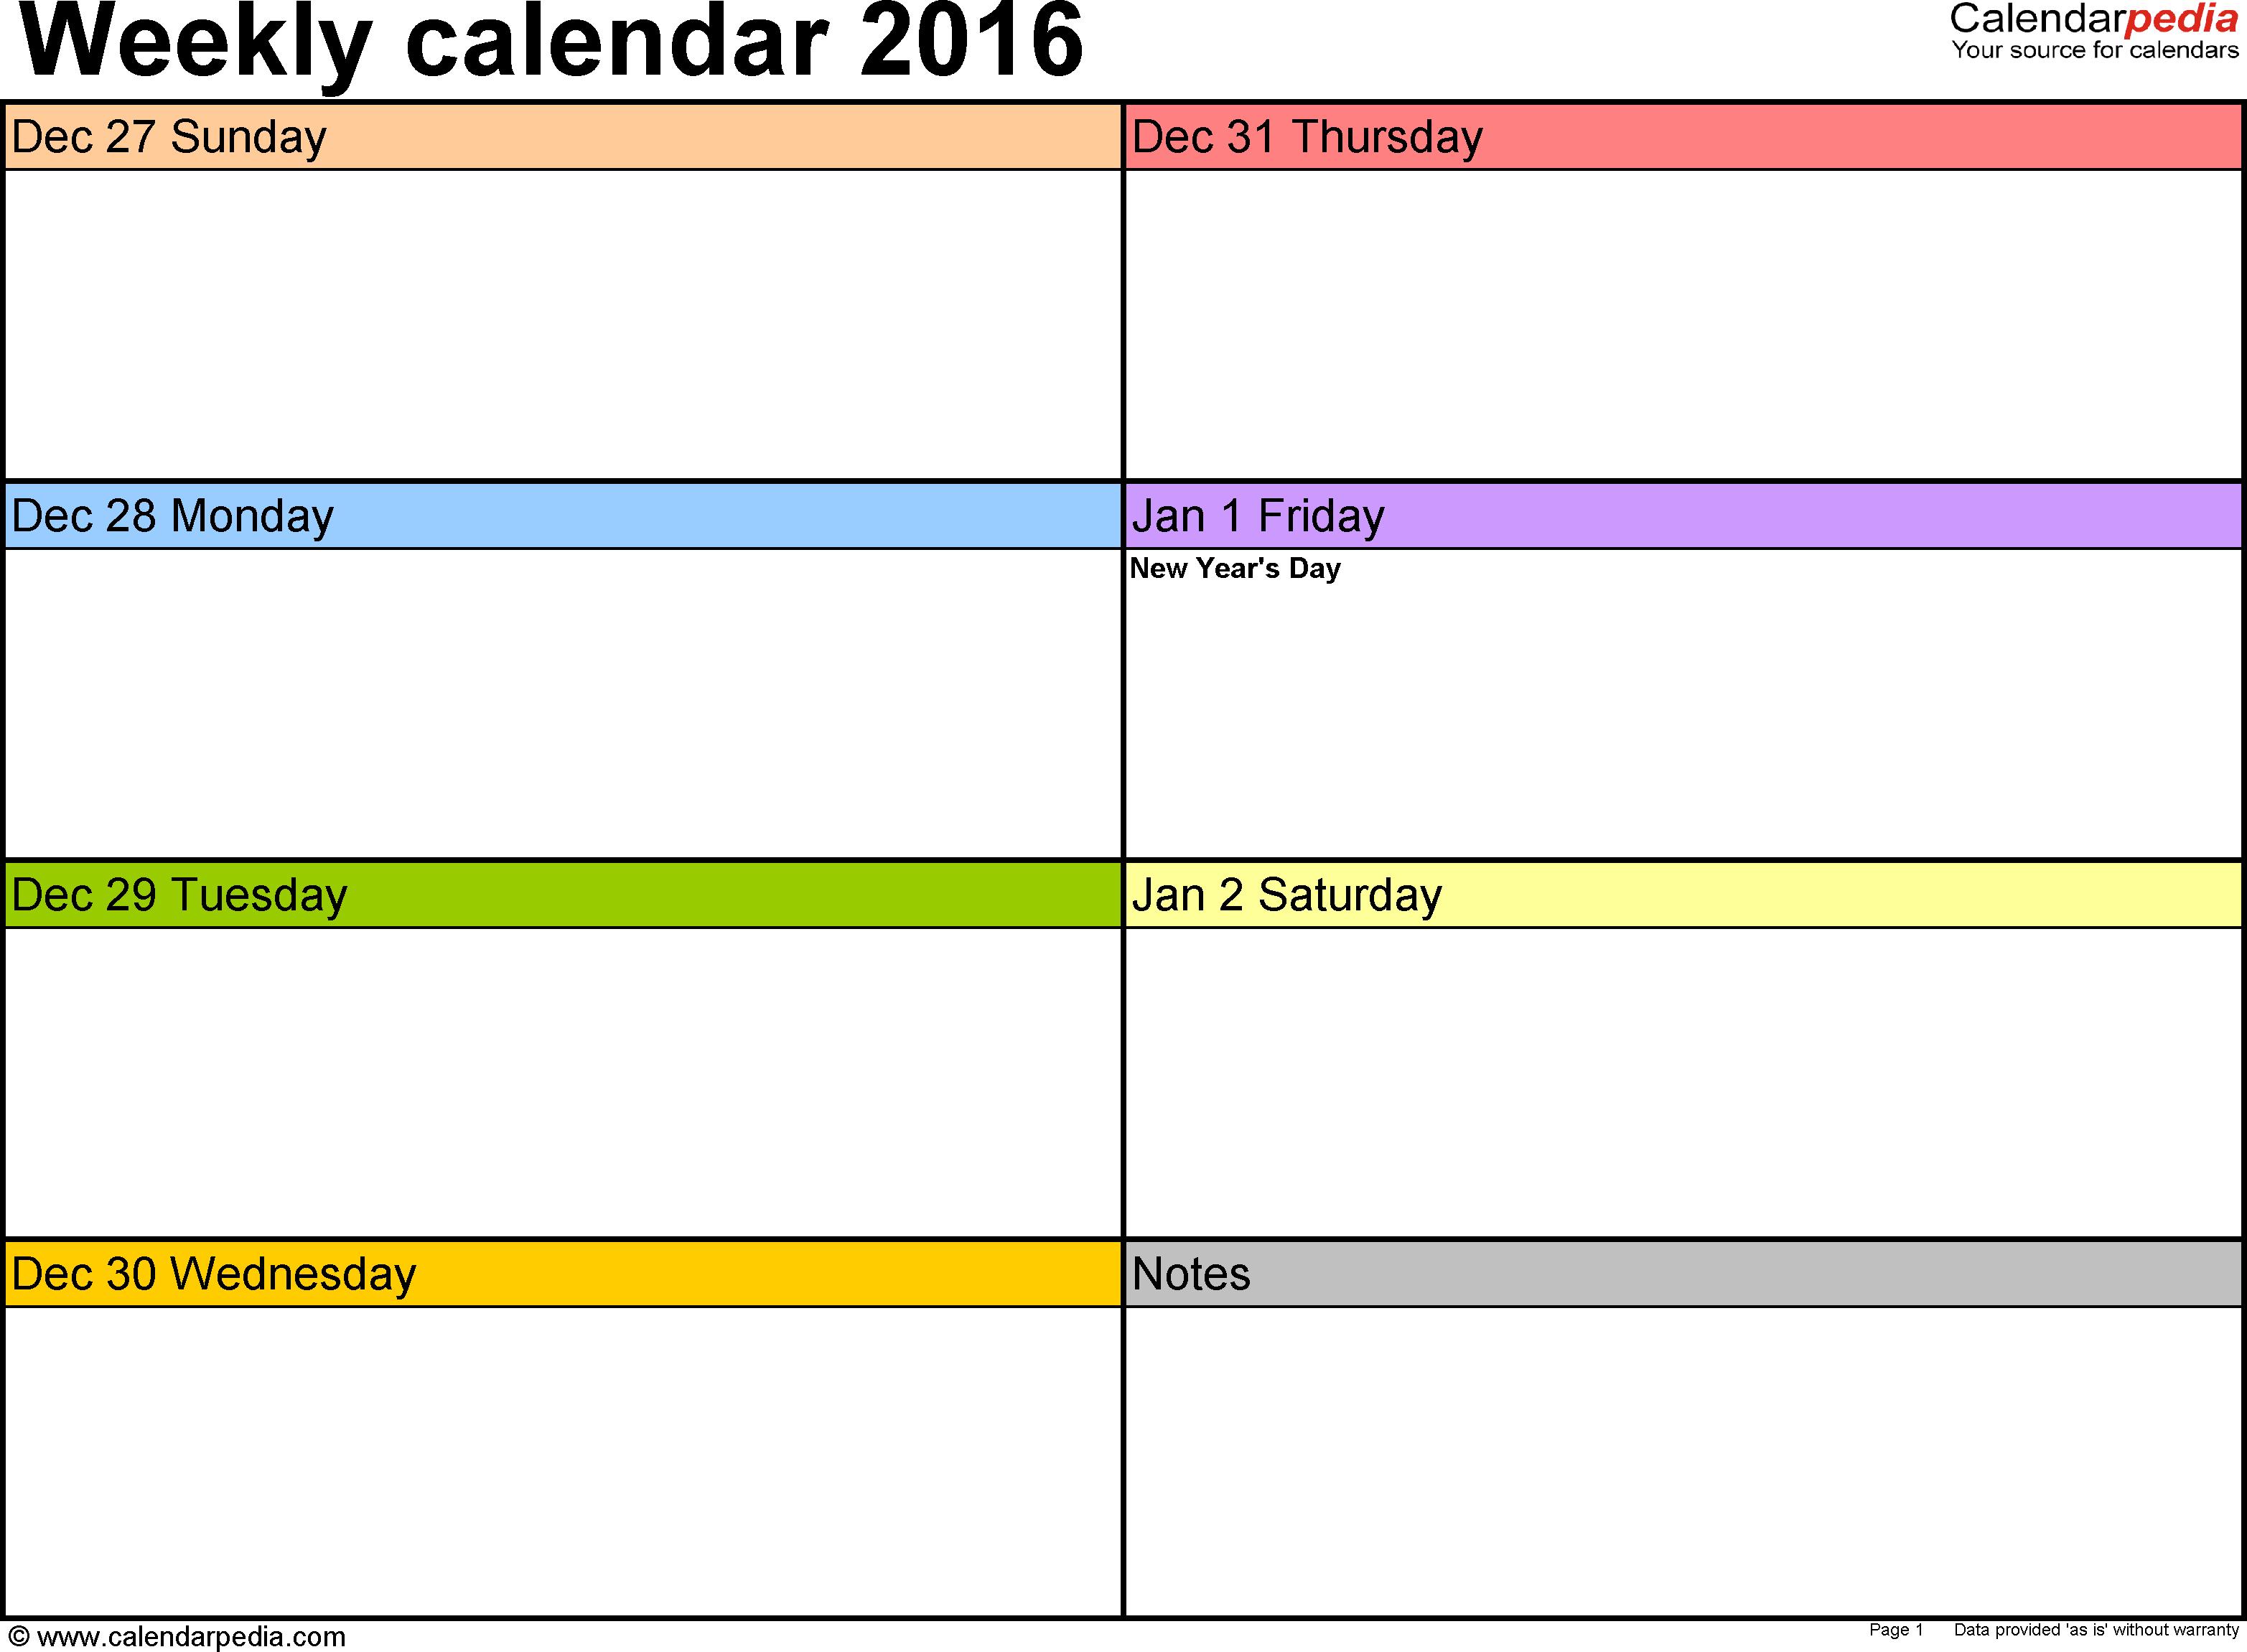 9 Images of Printable Weekly Calendar Template 2016